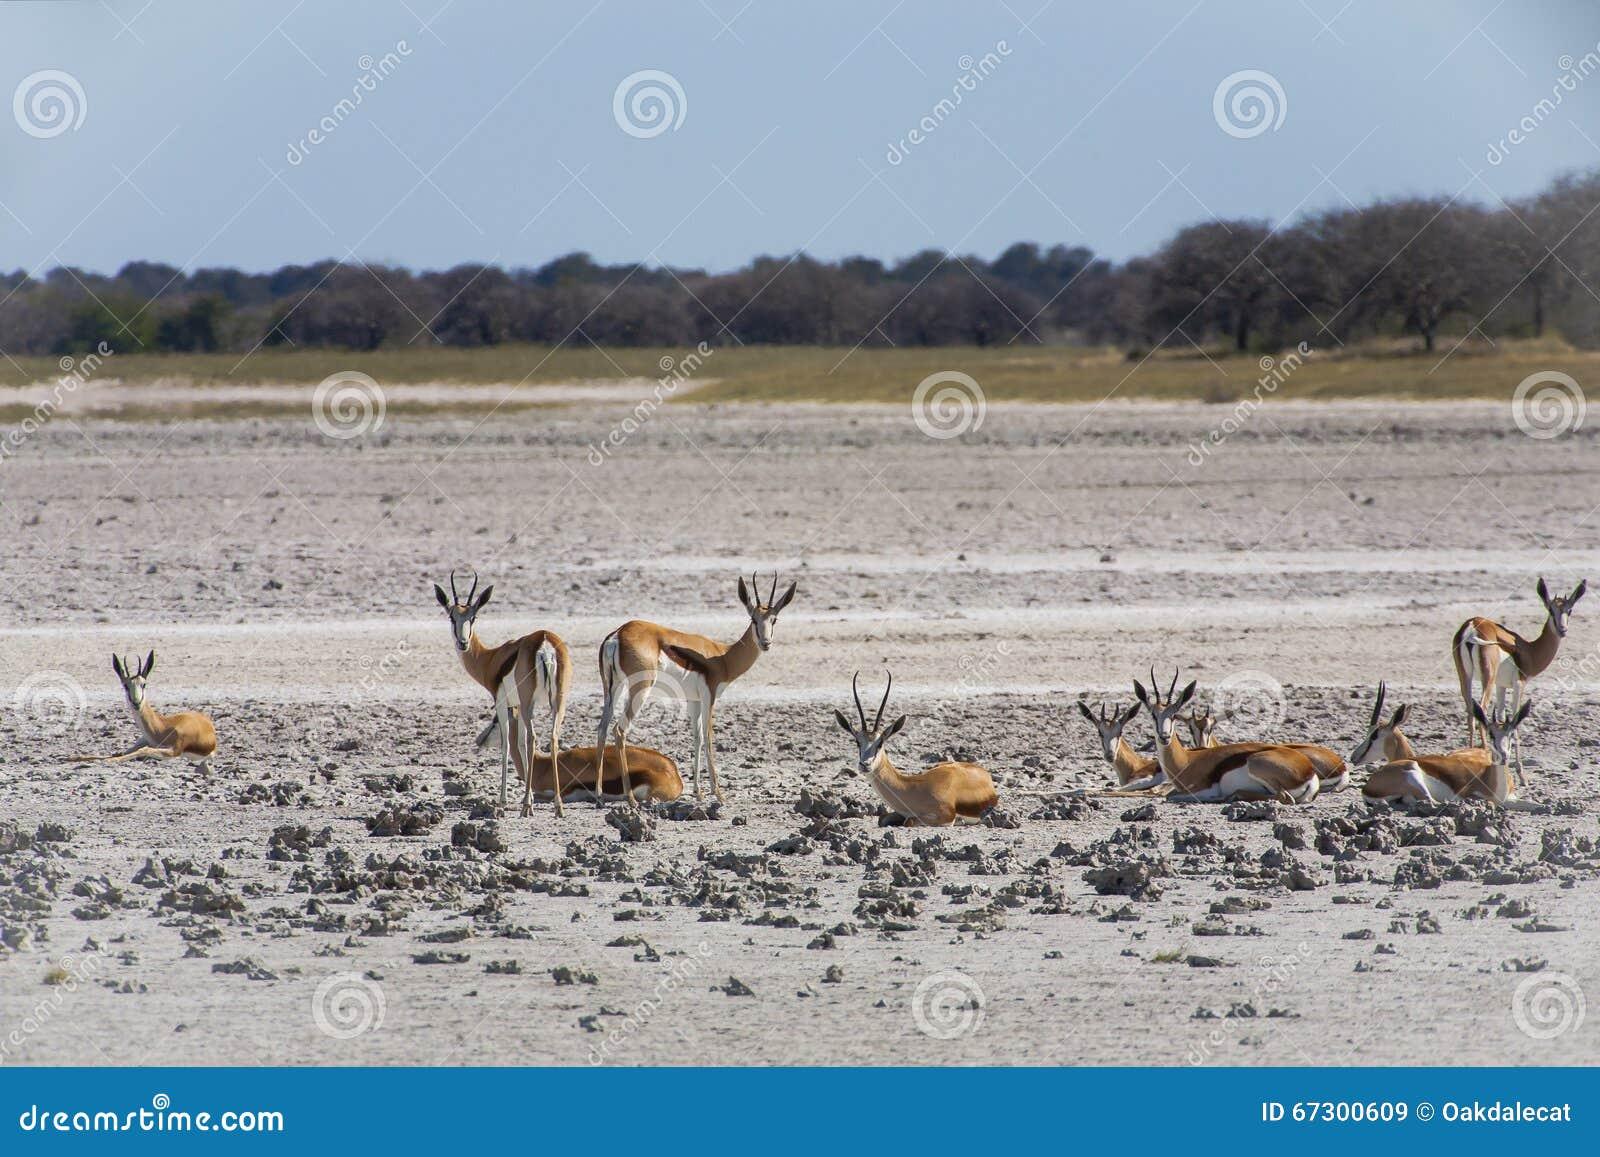 Springbok Herd in Makgadikgadi Pan, Botswana